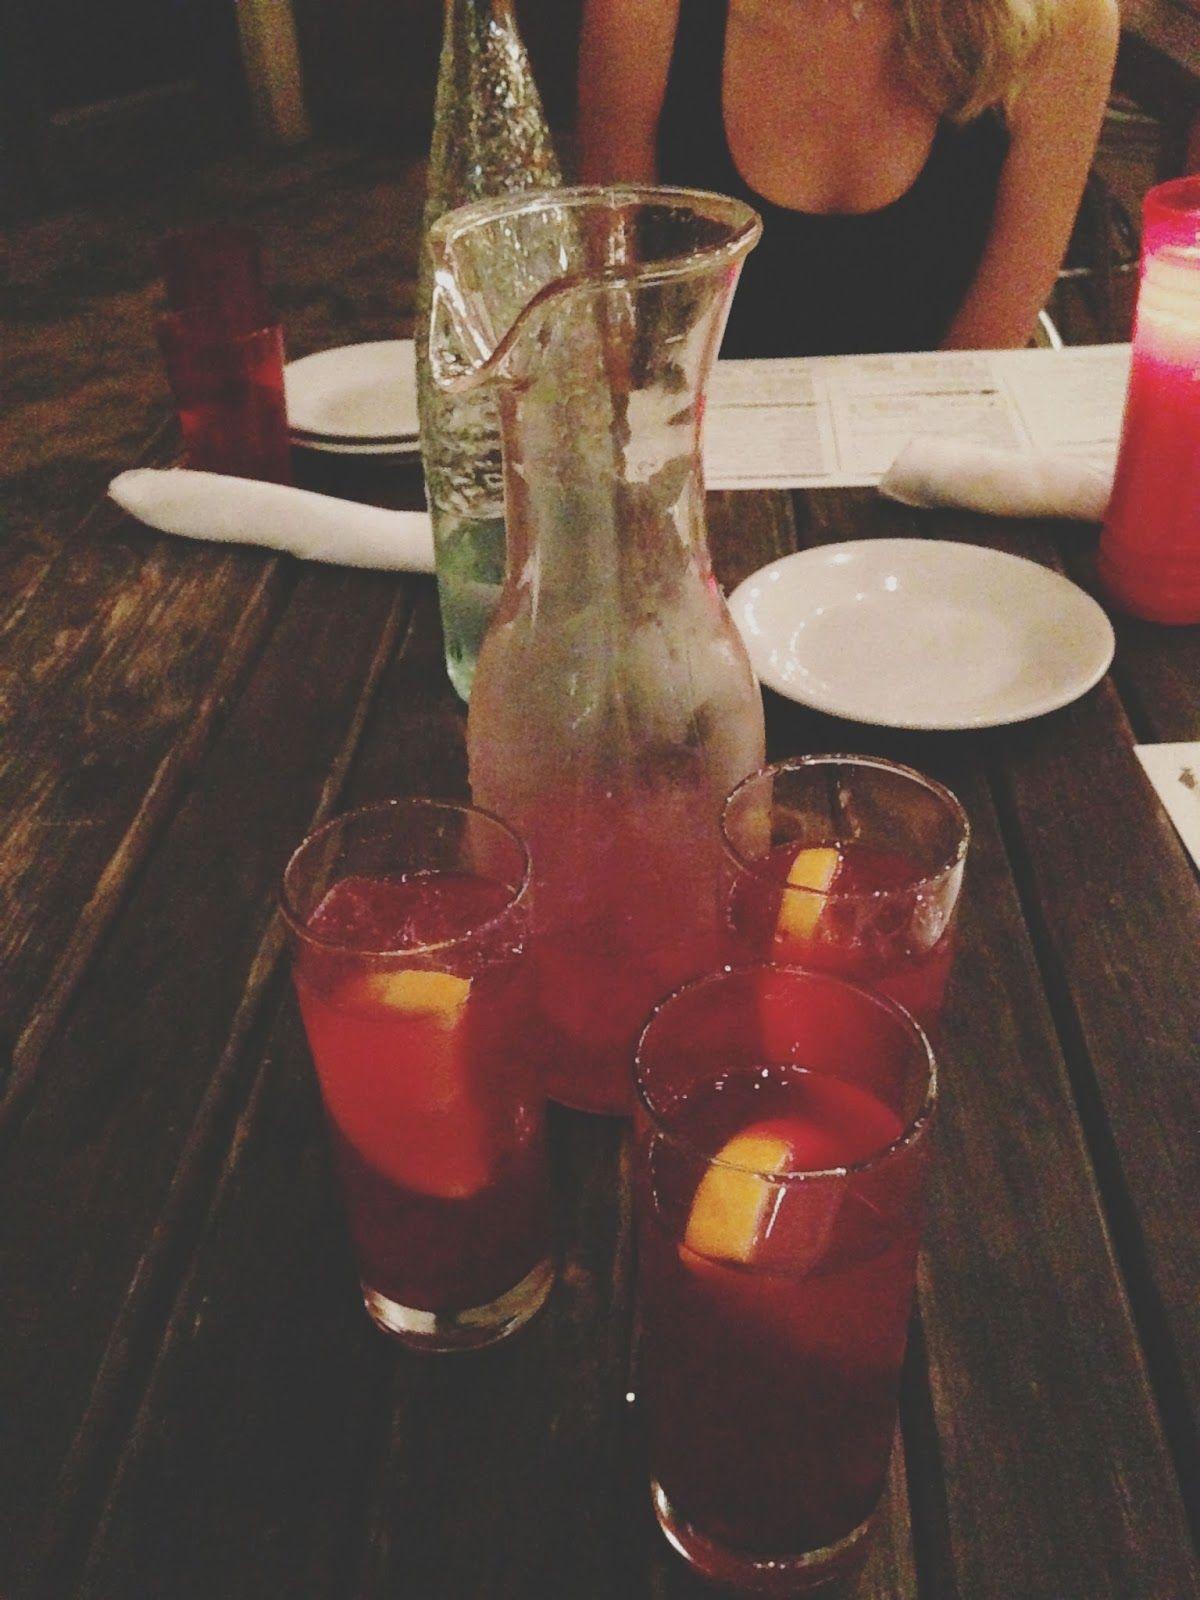 Batanga With Images Restaurant Recipes Houston Food Food